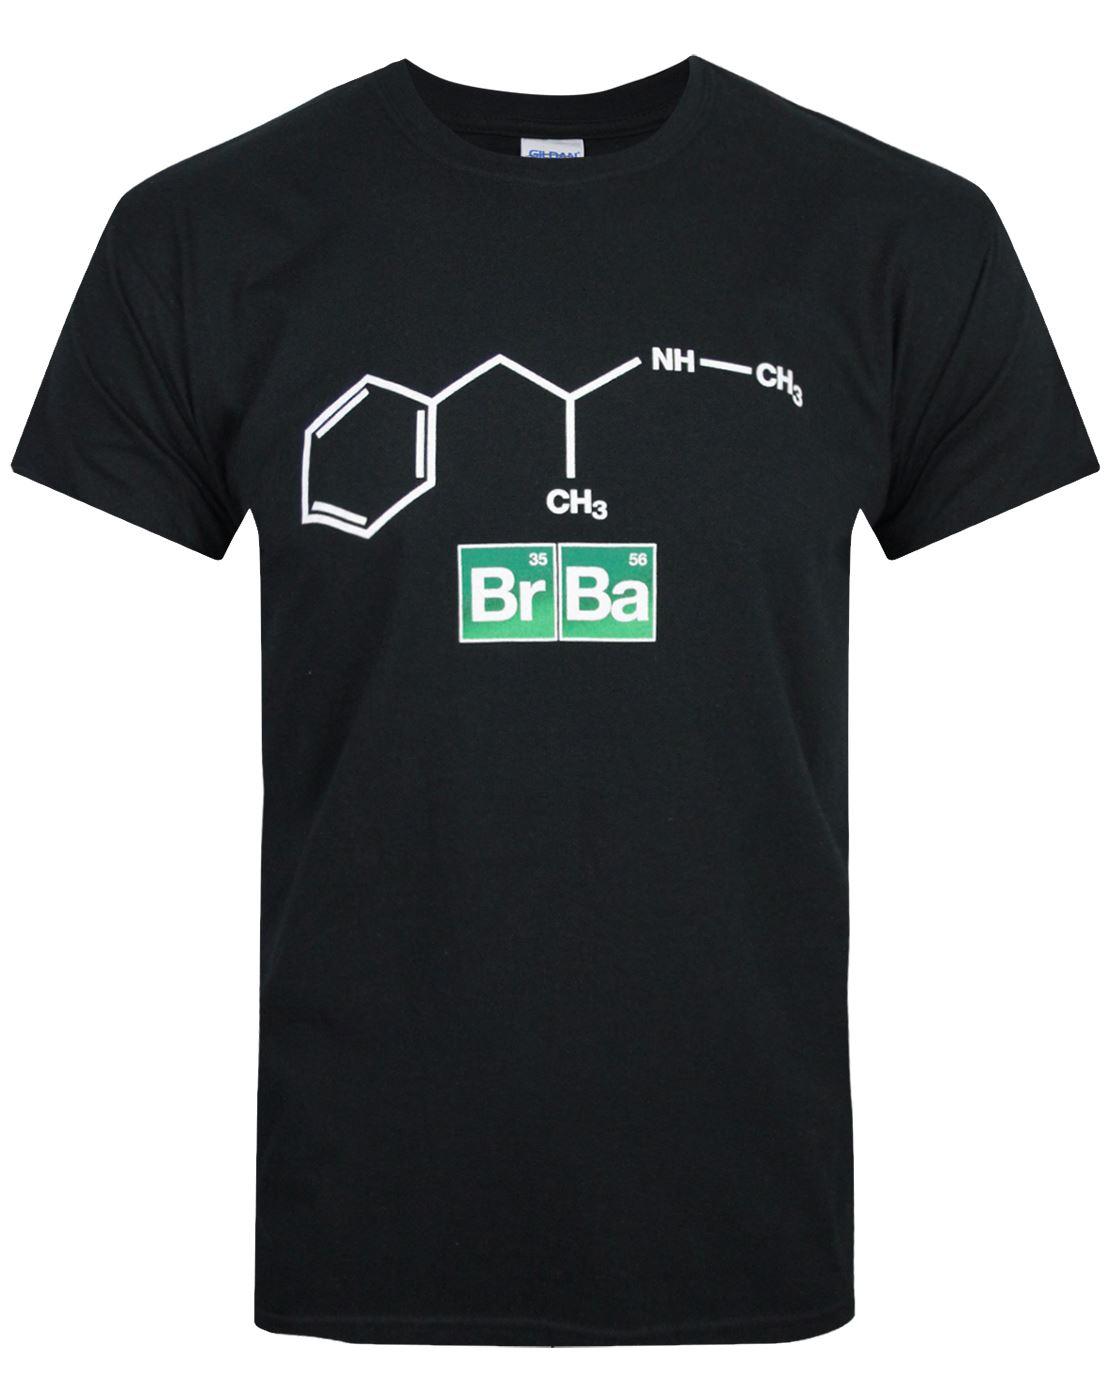 bbf67889796b1e Image is loading Breaking-Bad-Symbols-Logo-Men-039-s-T-Shirt